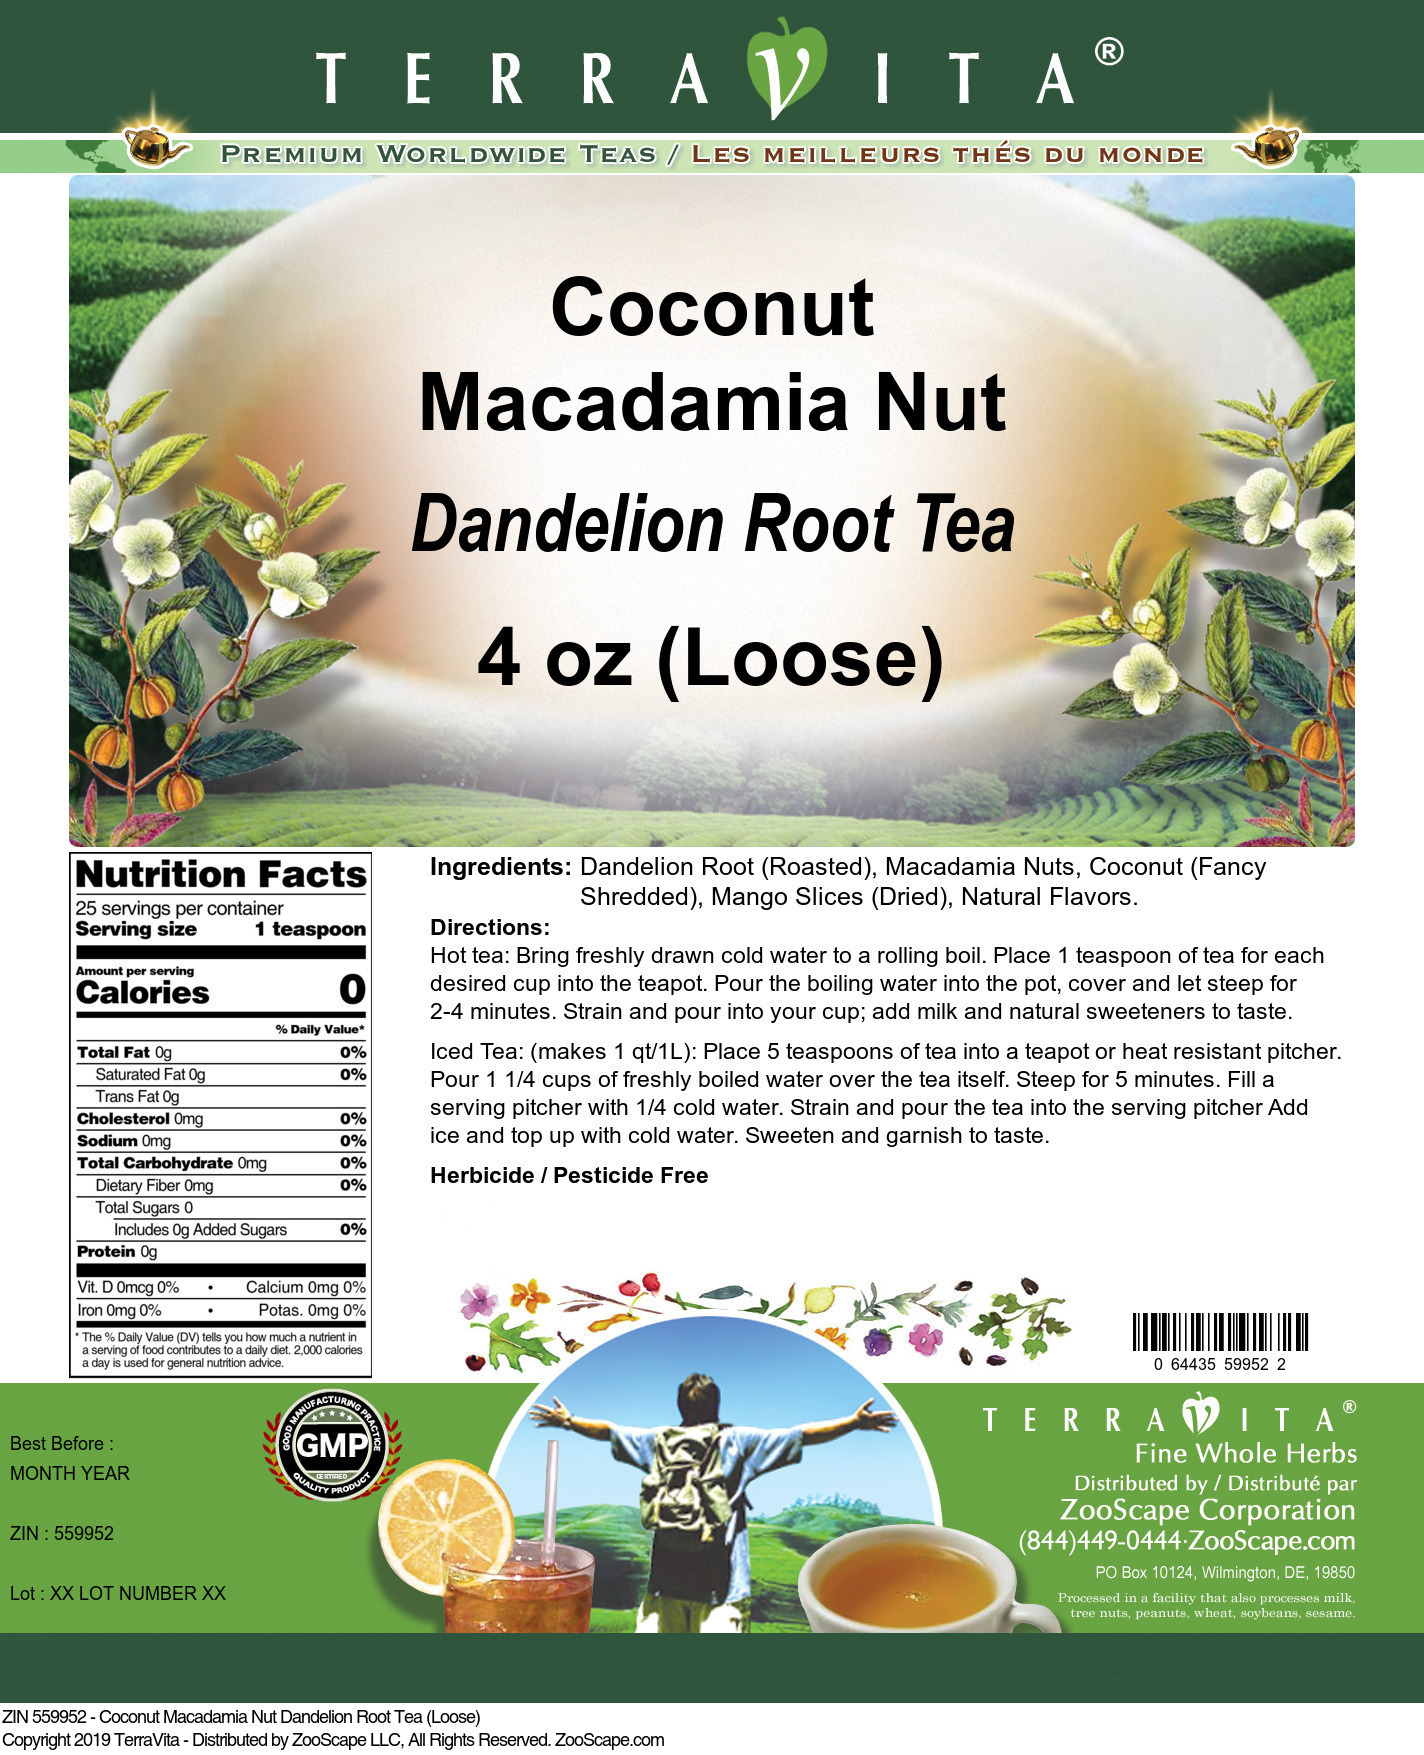 Coconut Macadamia Nut Dandelion Root